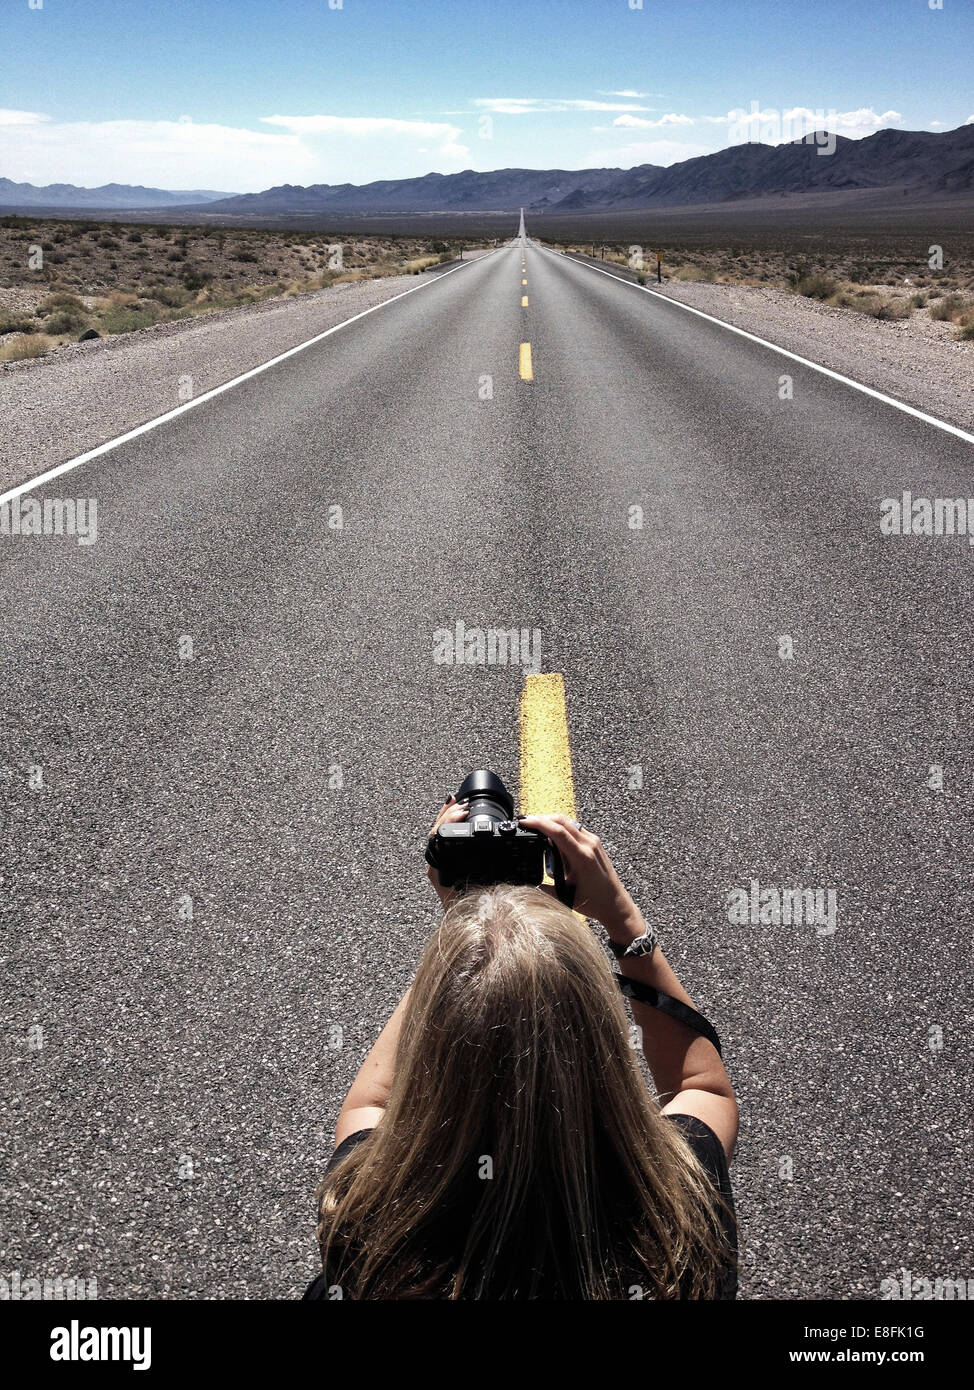 Woman taking photograph of empty road, California, America, USA - Stock Image